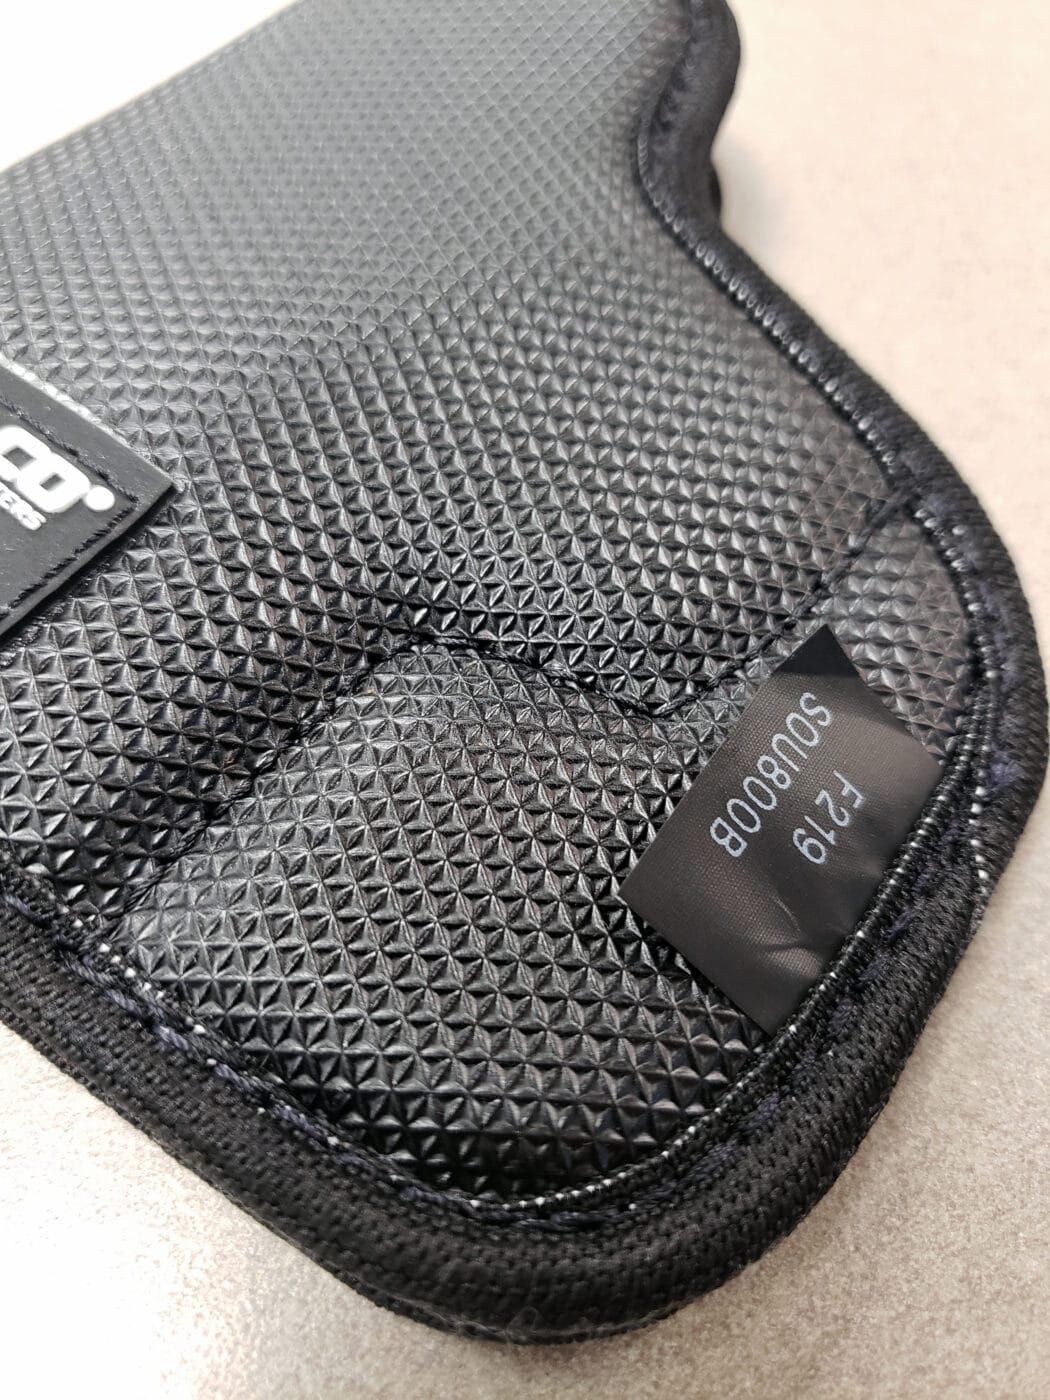 Exterior surface close-up of the StukOn-U pocket holster